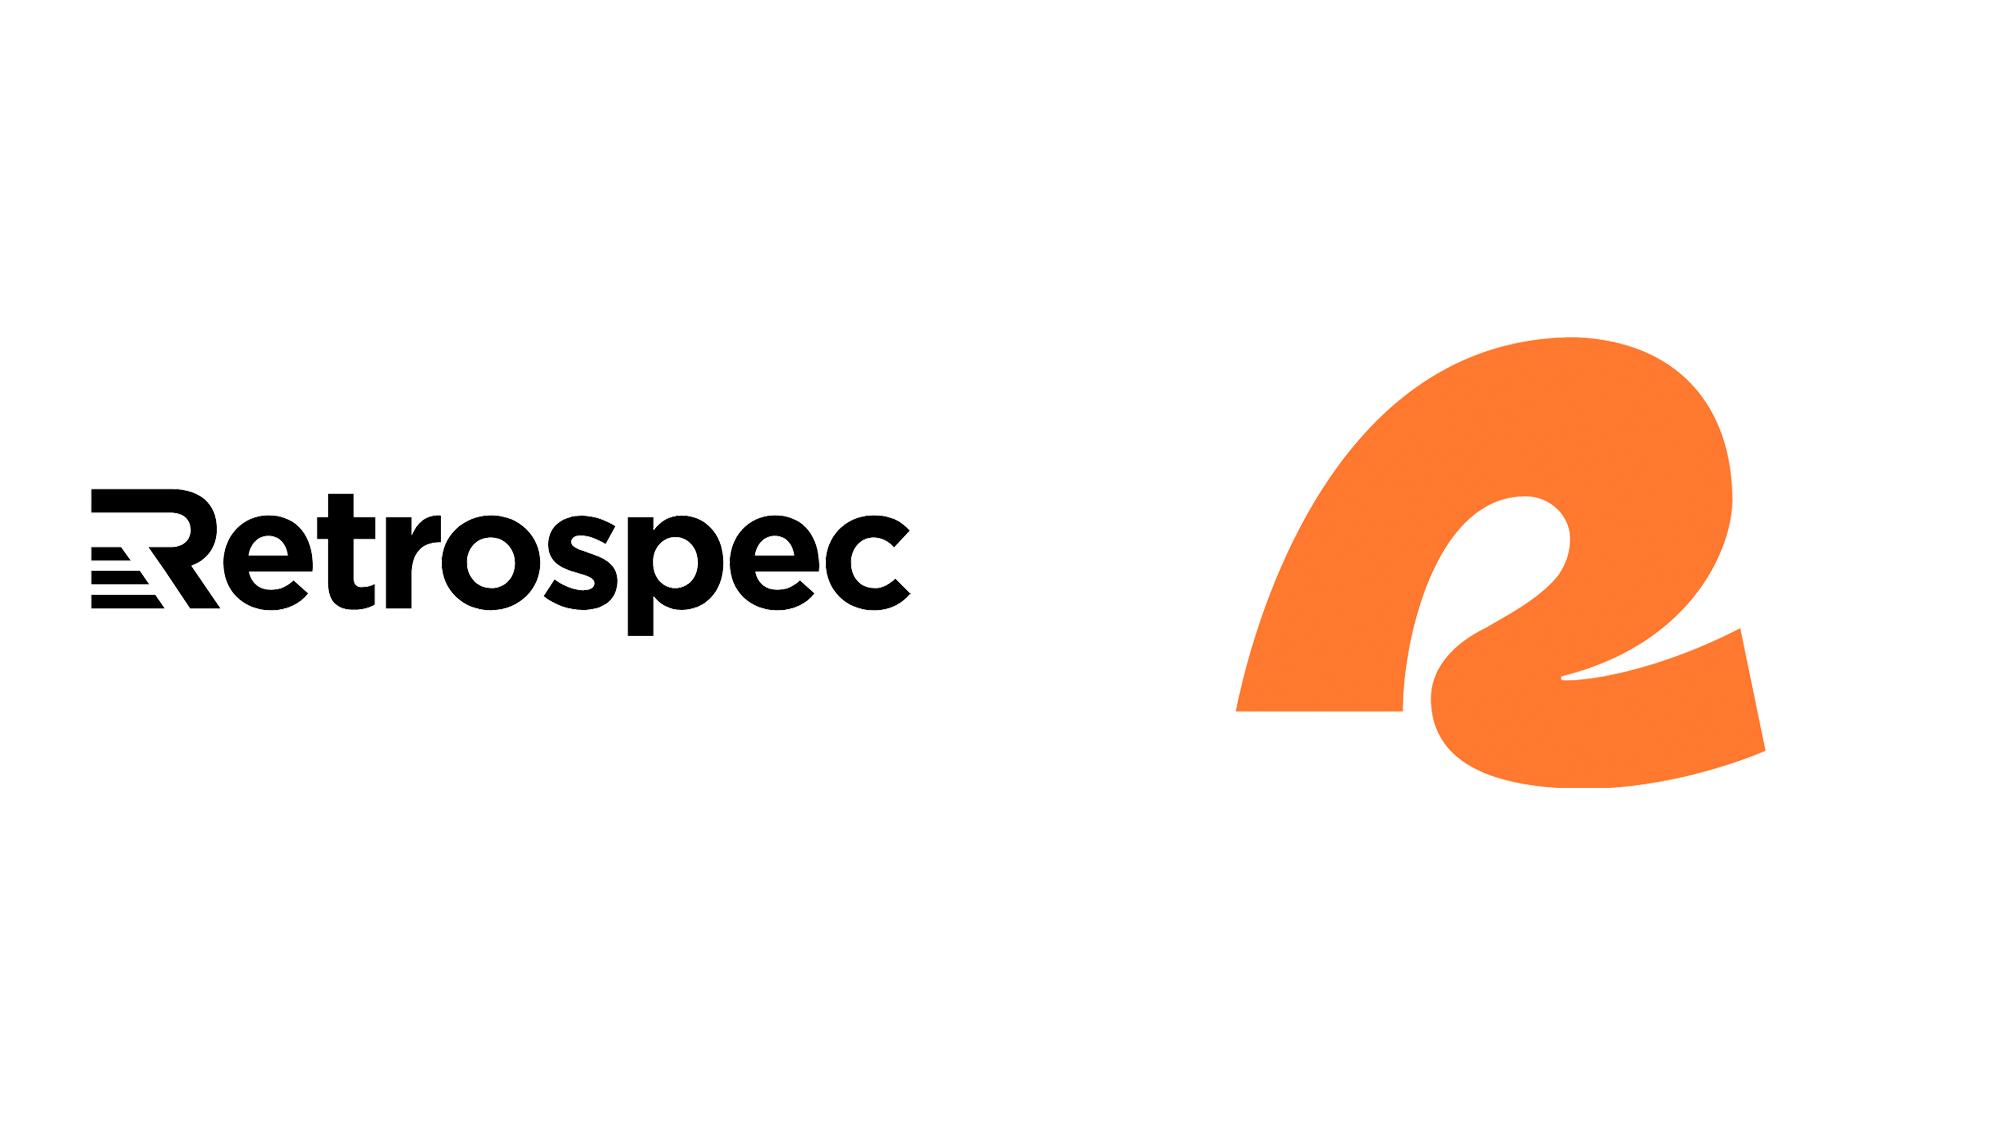 RETROSPEC